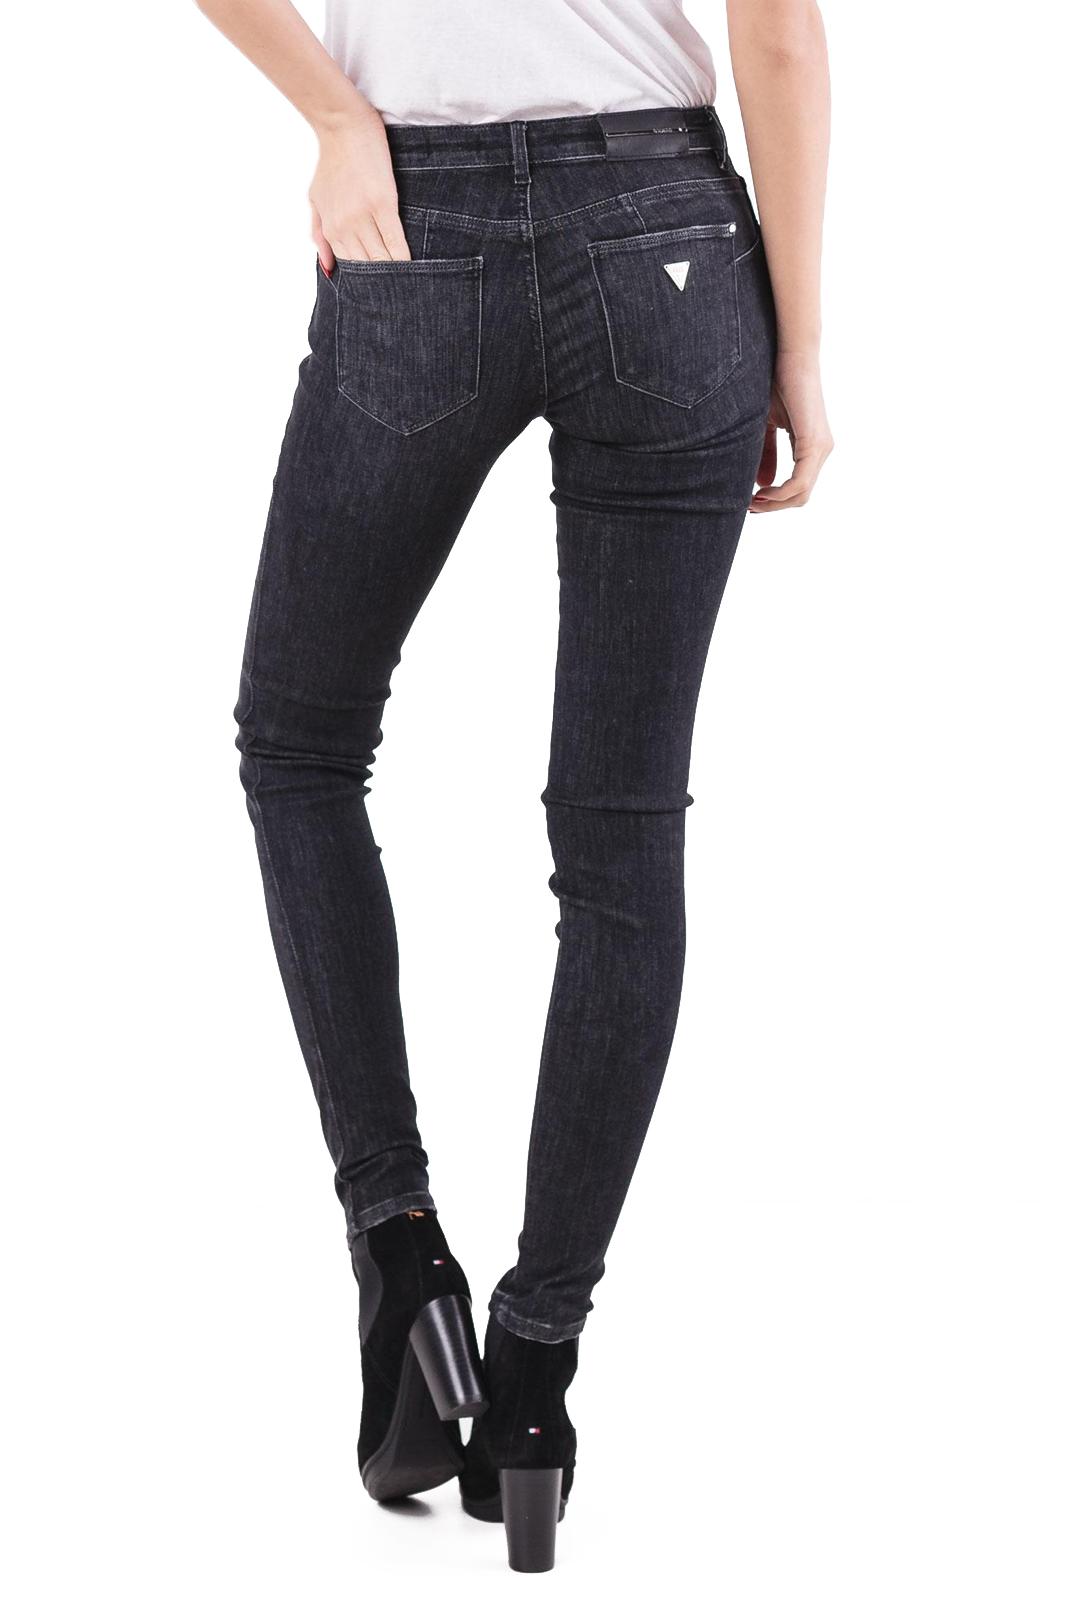 Jeans   Guess jeans W84AJ2 D3BV0 ULTIMATE BLACK